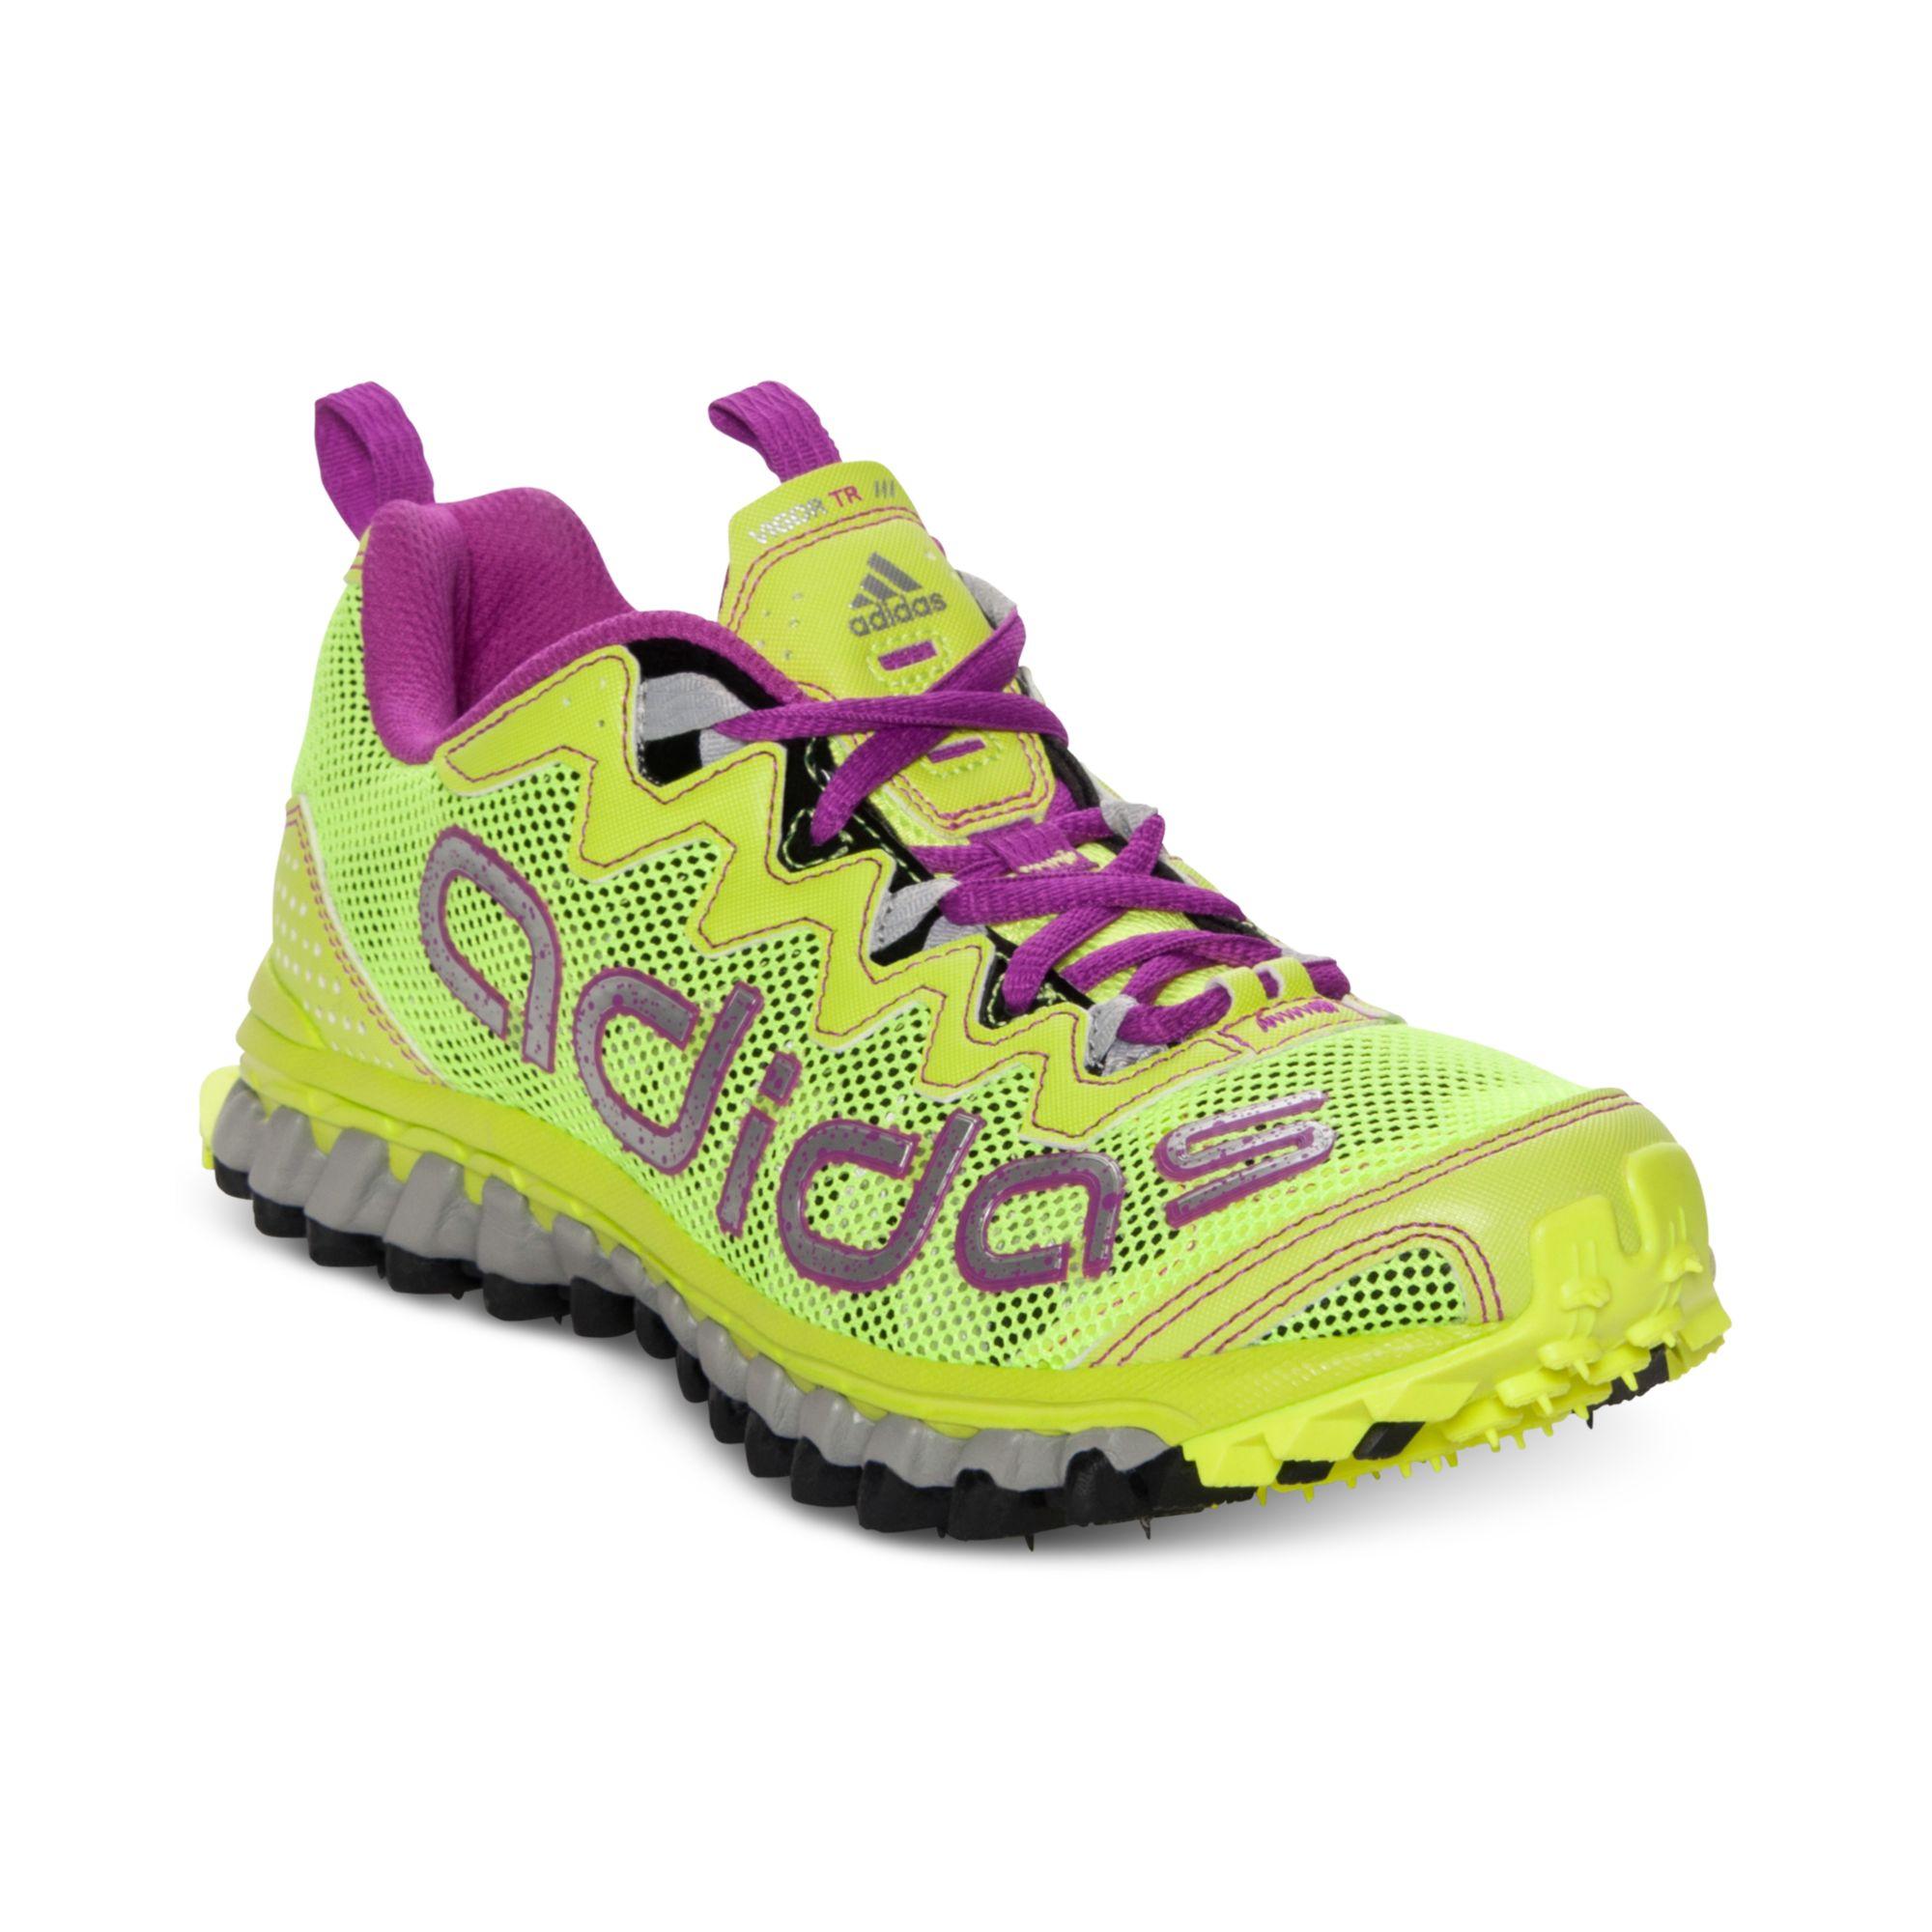 best sneakers 543ff 33ba6 Lyst - adidas Mens Shoes Vigor 3 Trail Running Sneakers in G